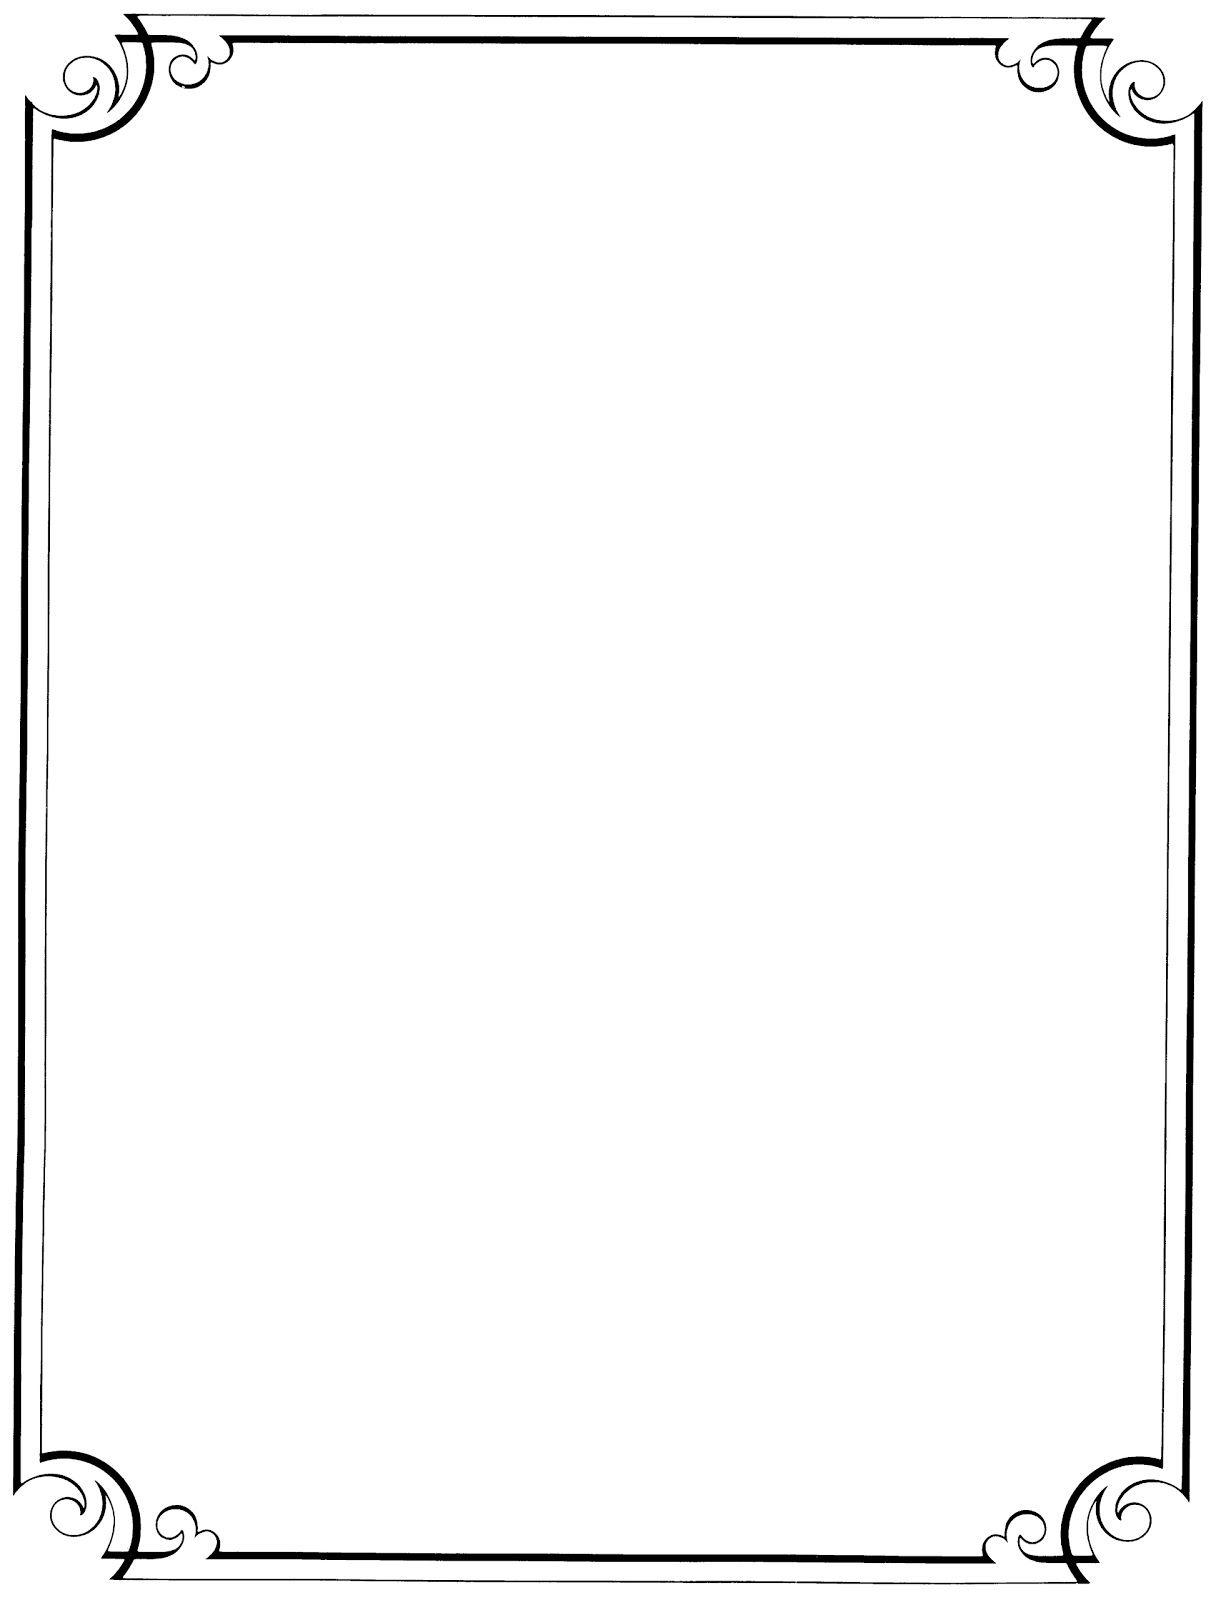 Free clip art borders. Clipart border page